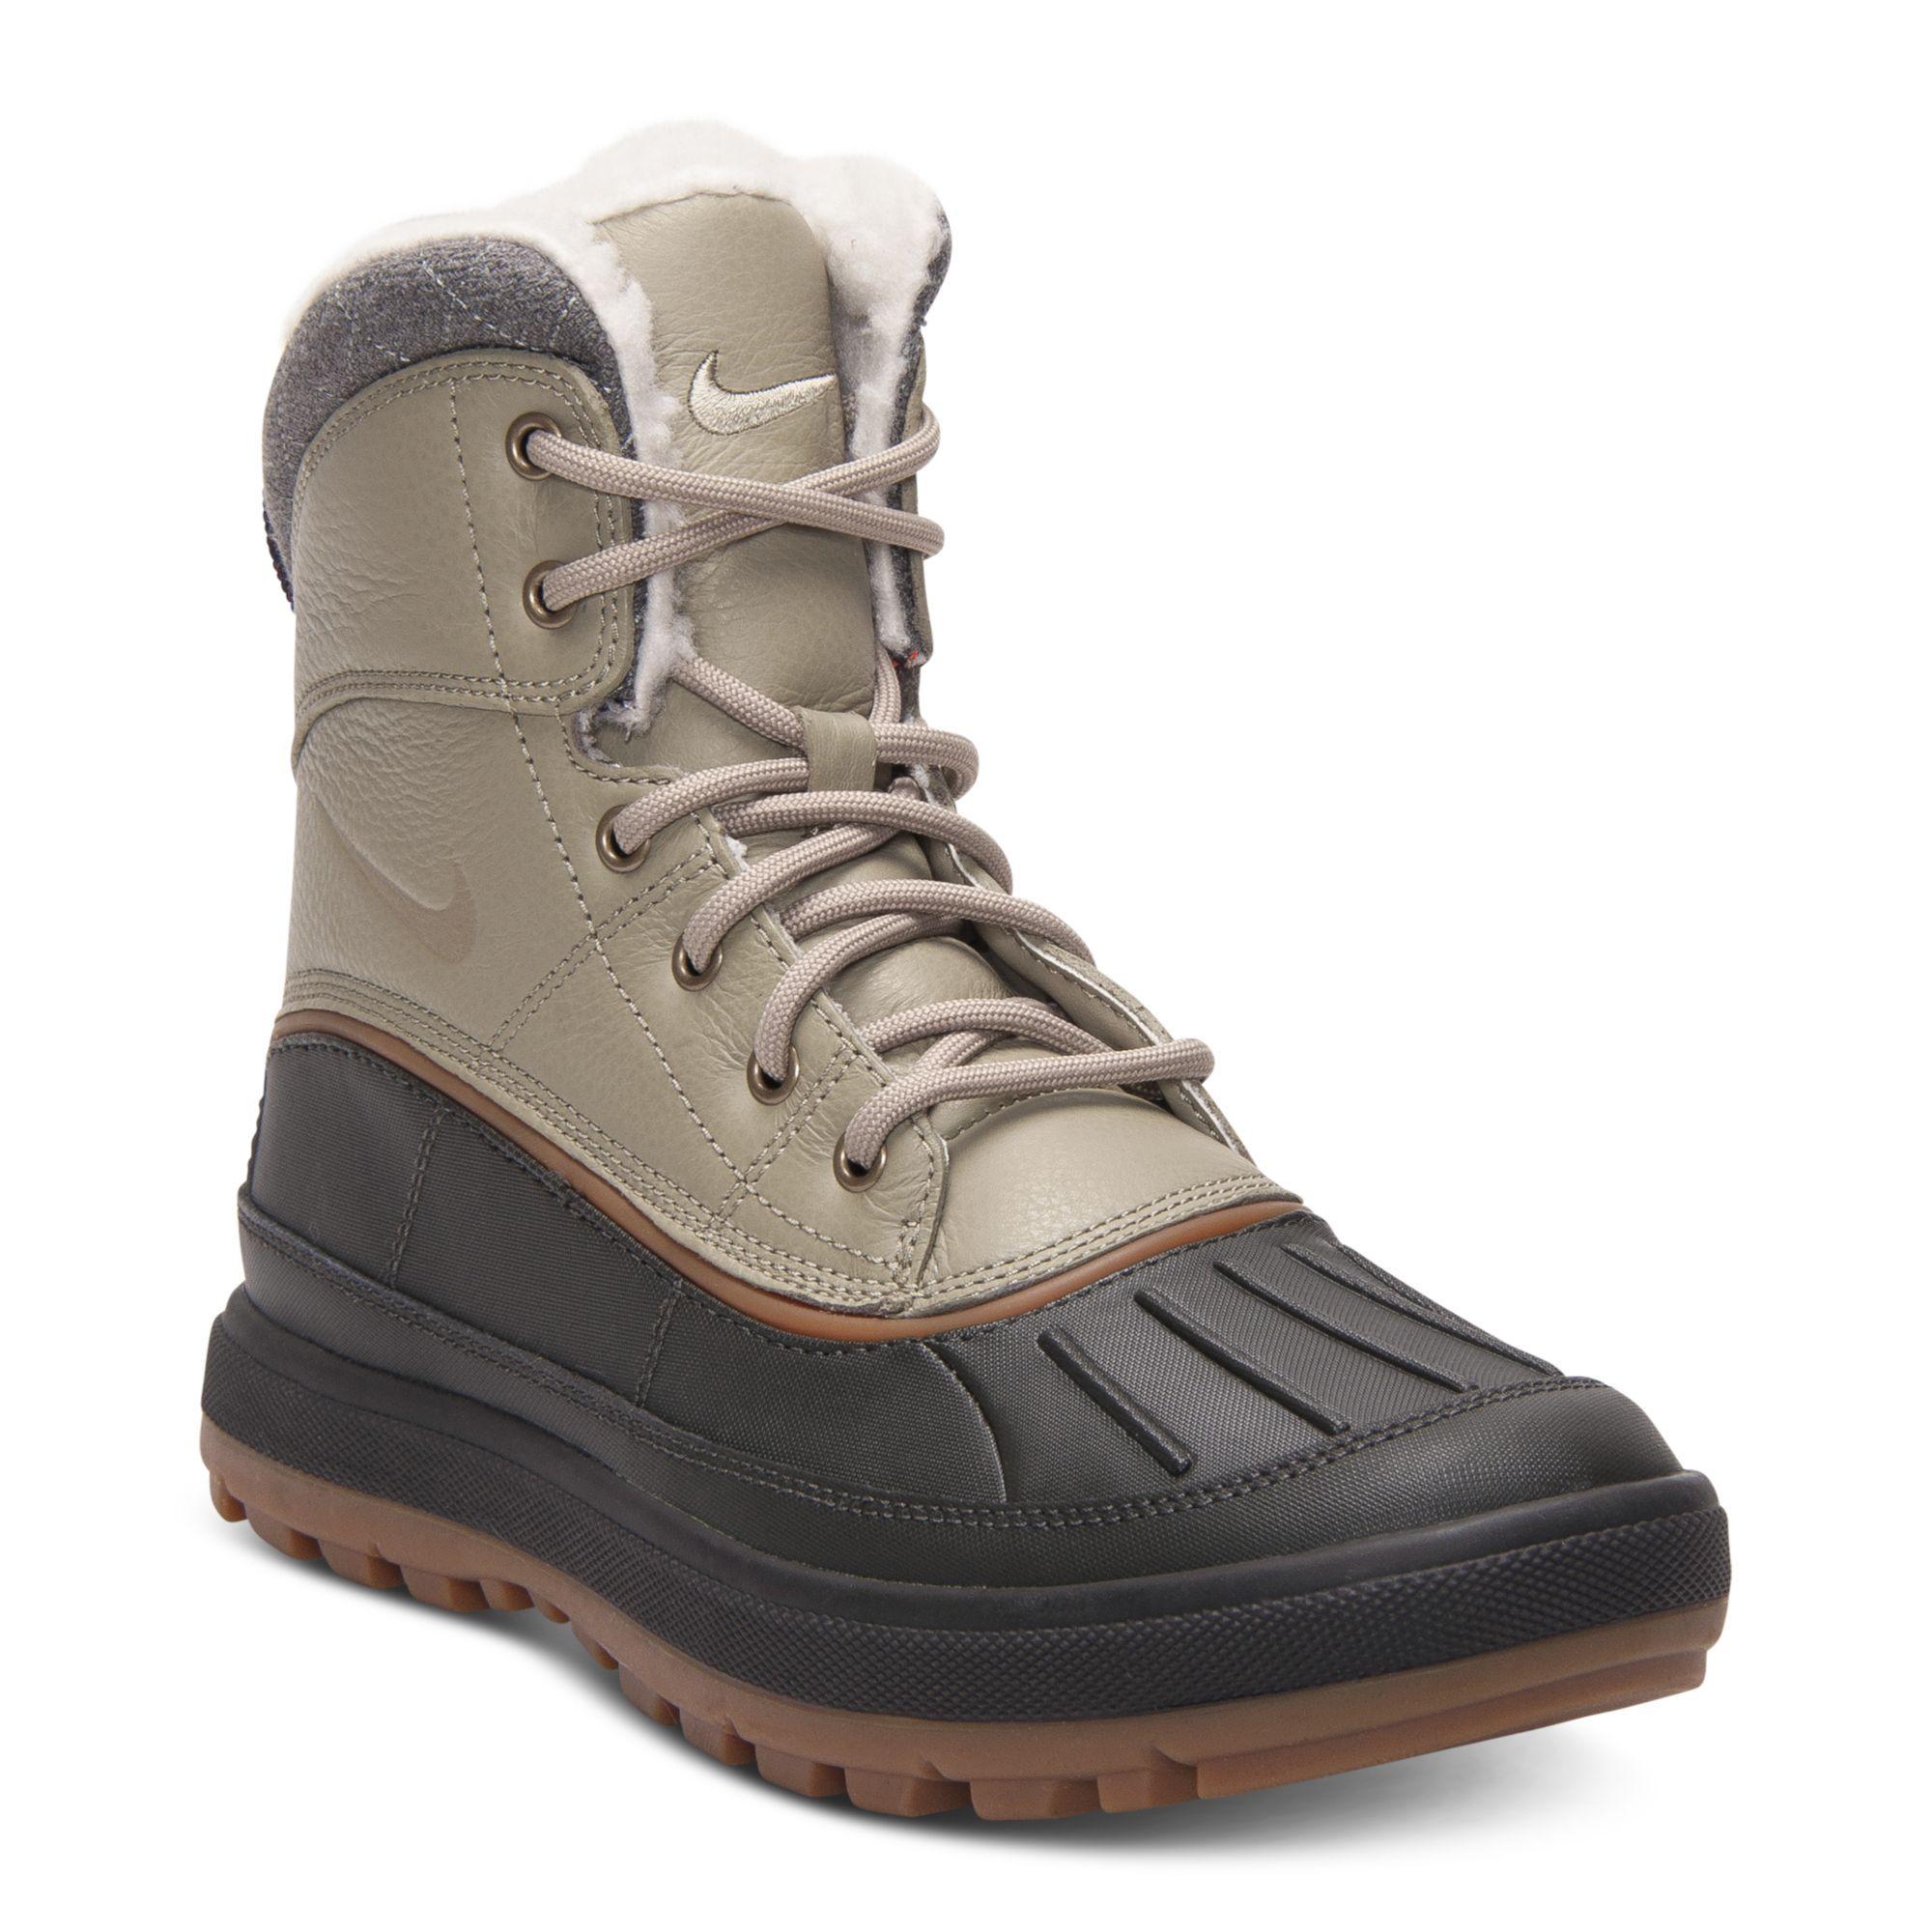 nike acg woodside boots 2013 nike woodside boots for men